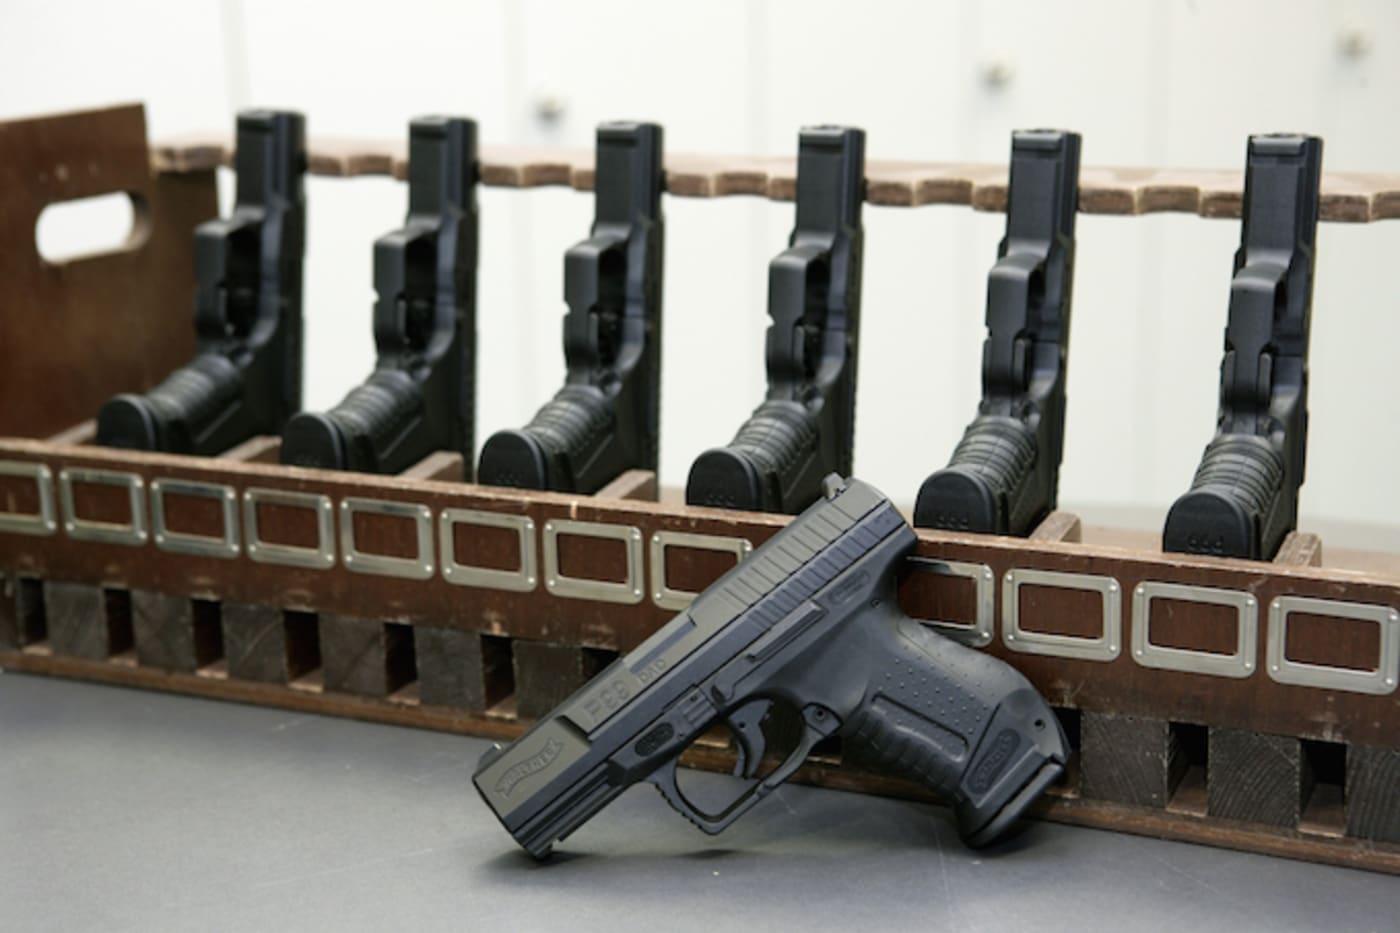 Guns Domestive Violence